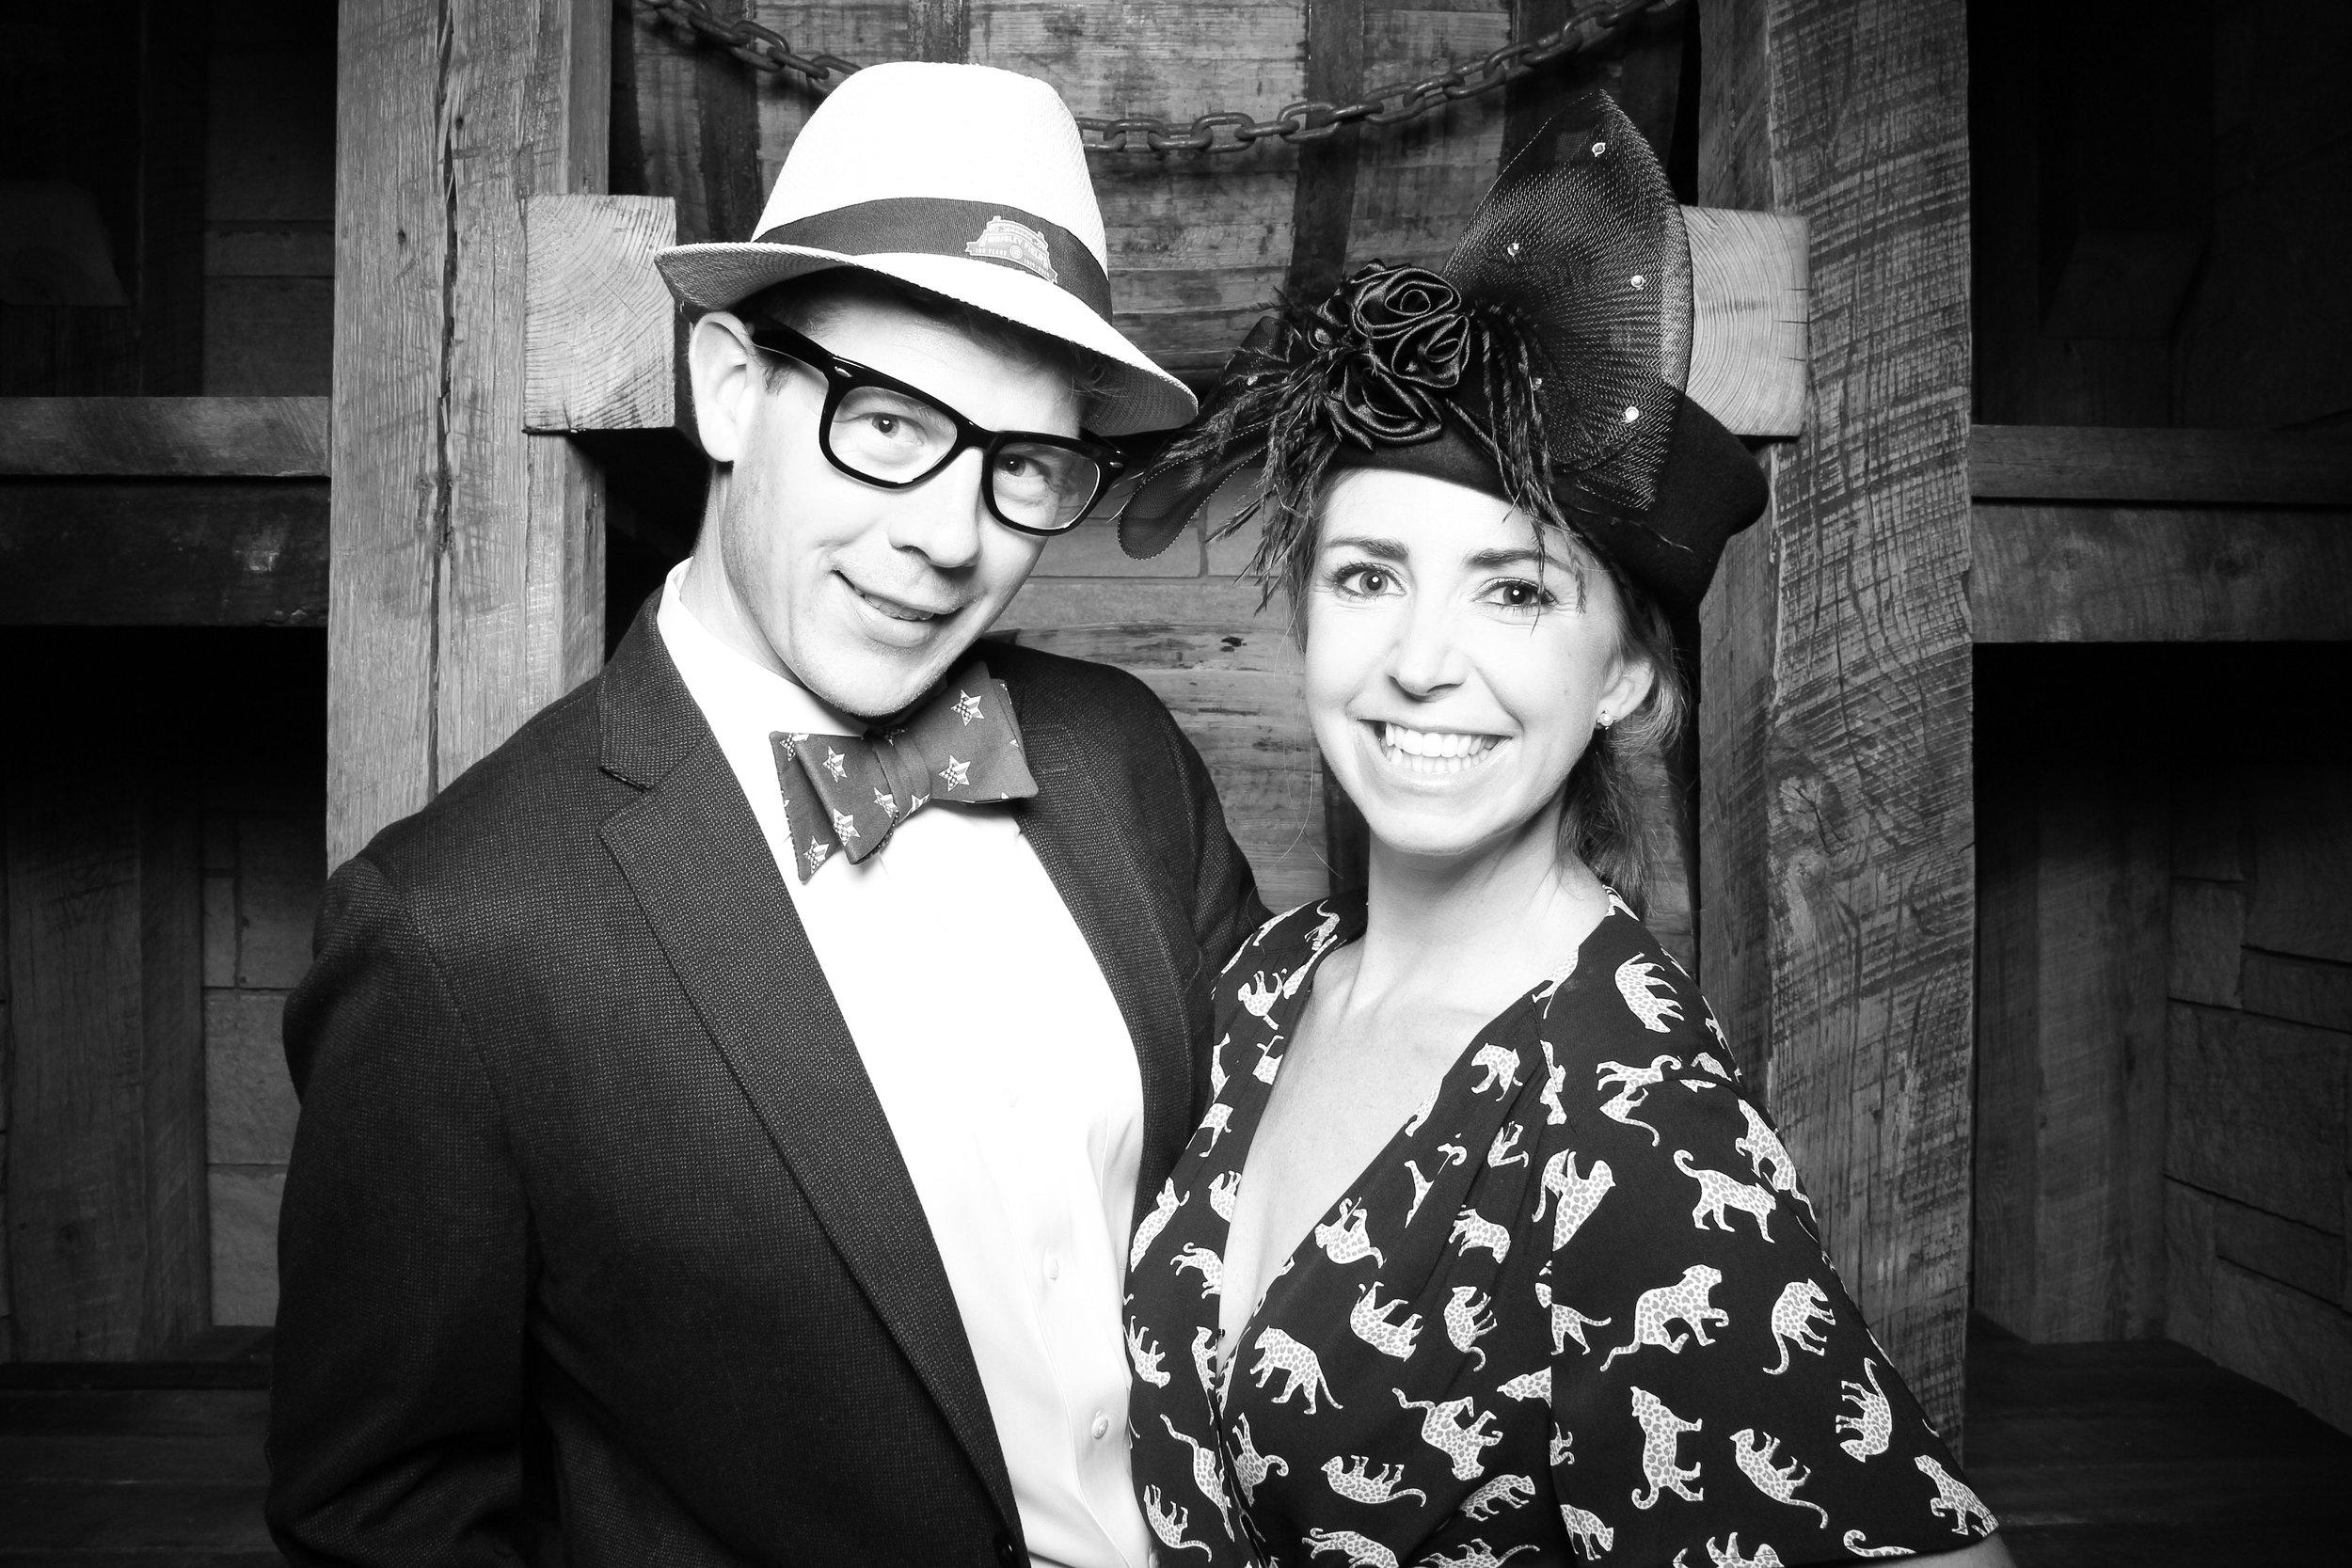 Chicago_Vintage_Wedding_Photobooth_Wrigley_Field_10.jpg